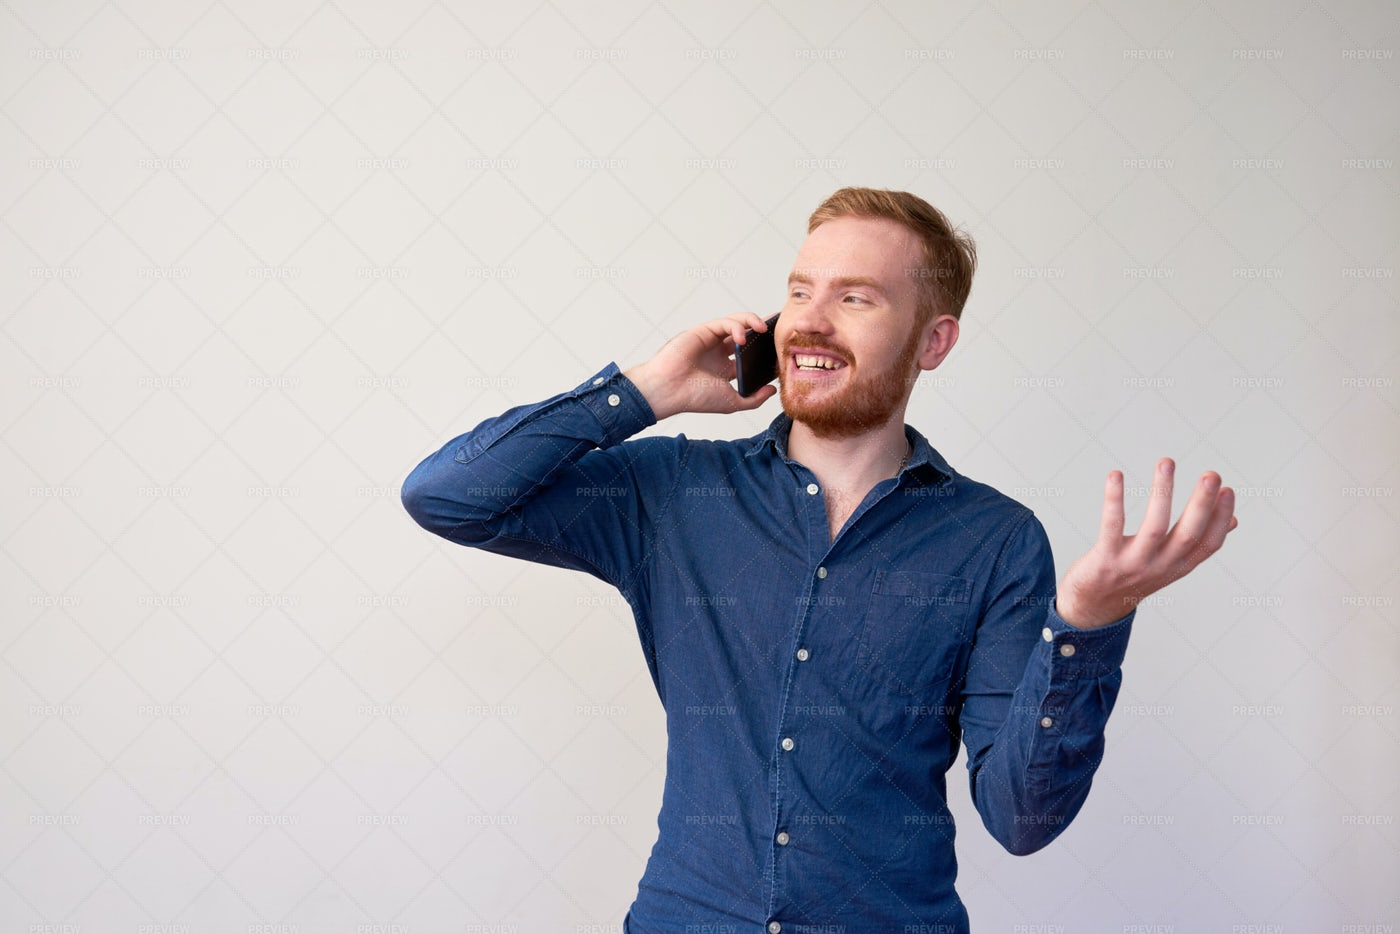 Happy Man Making Phone Call: Stock Photos